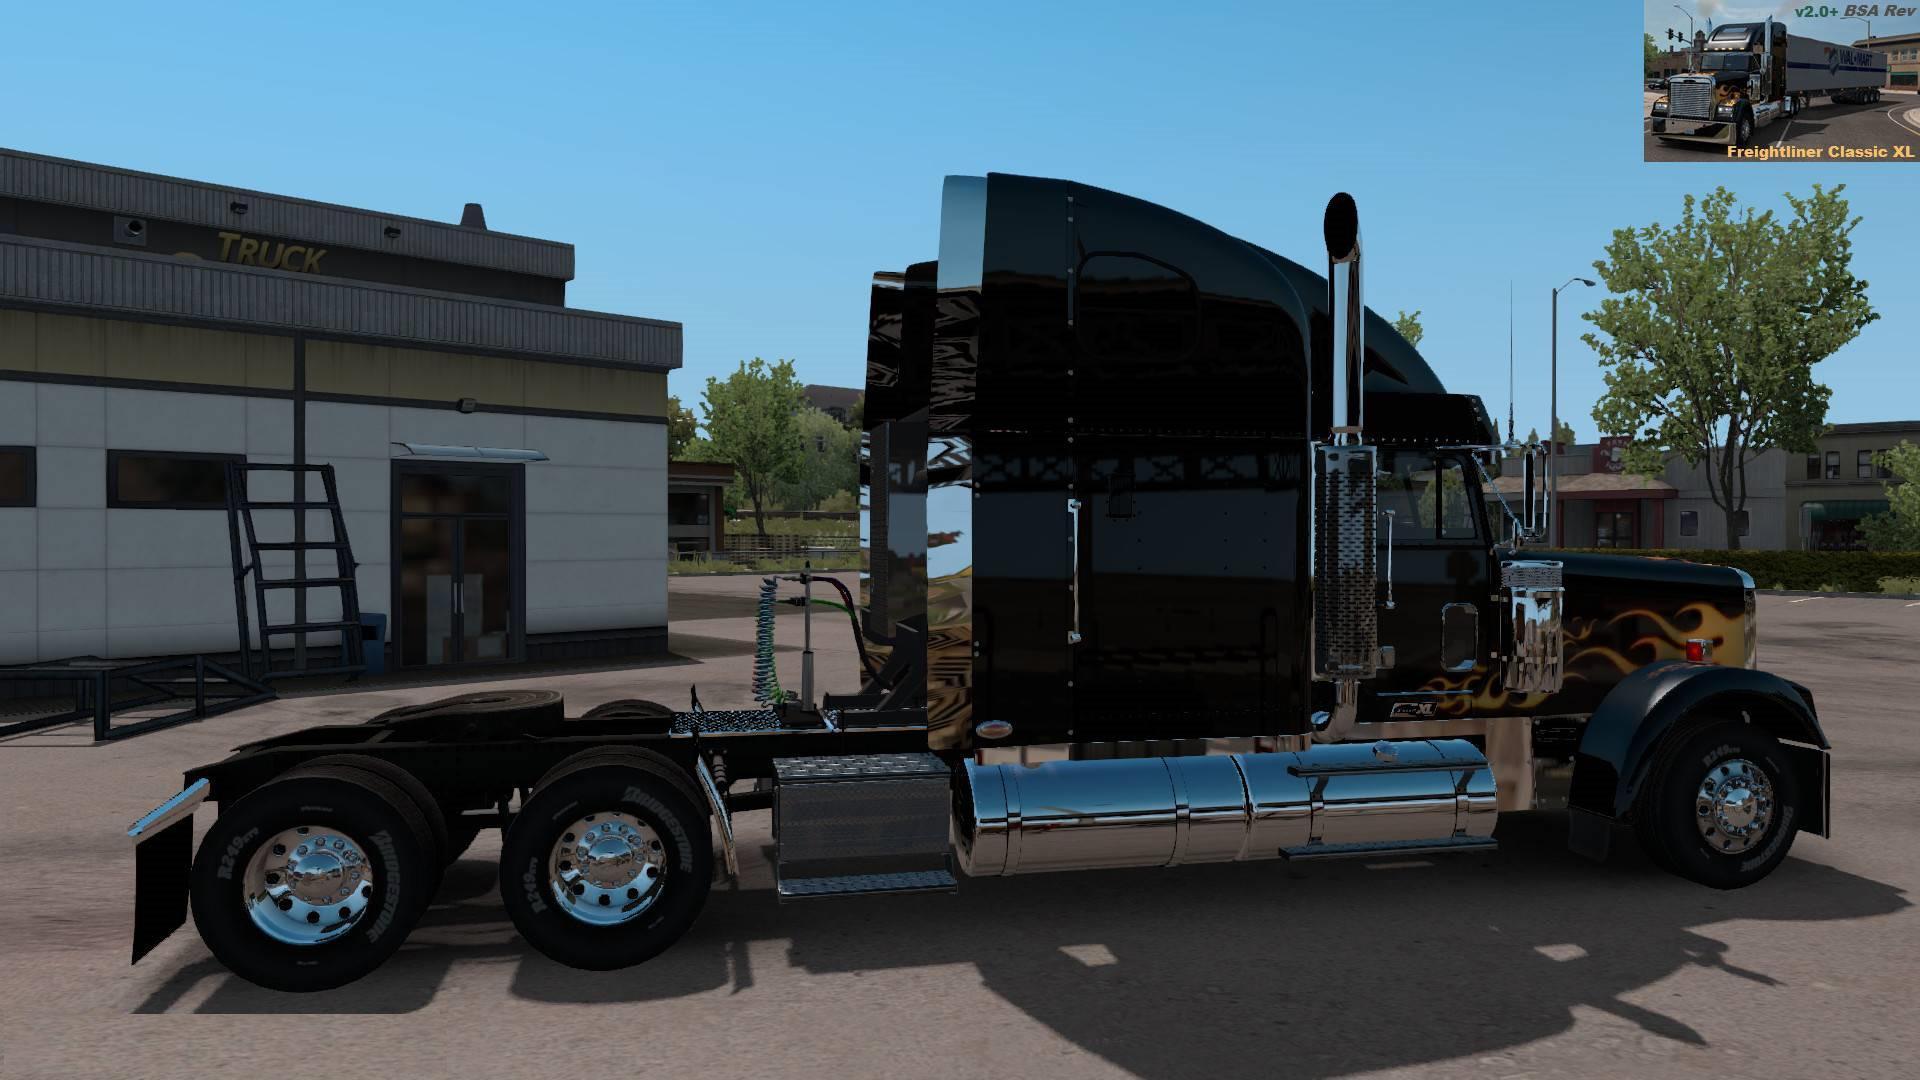 Freightliner Classic Xl V2 0 1 35 1 36 Ats Mods American Truck Simulator Mods Atsmod Net